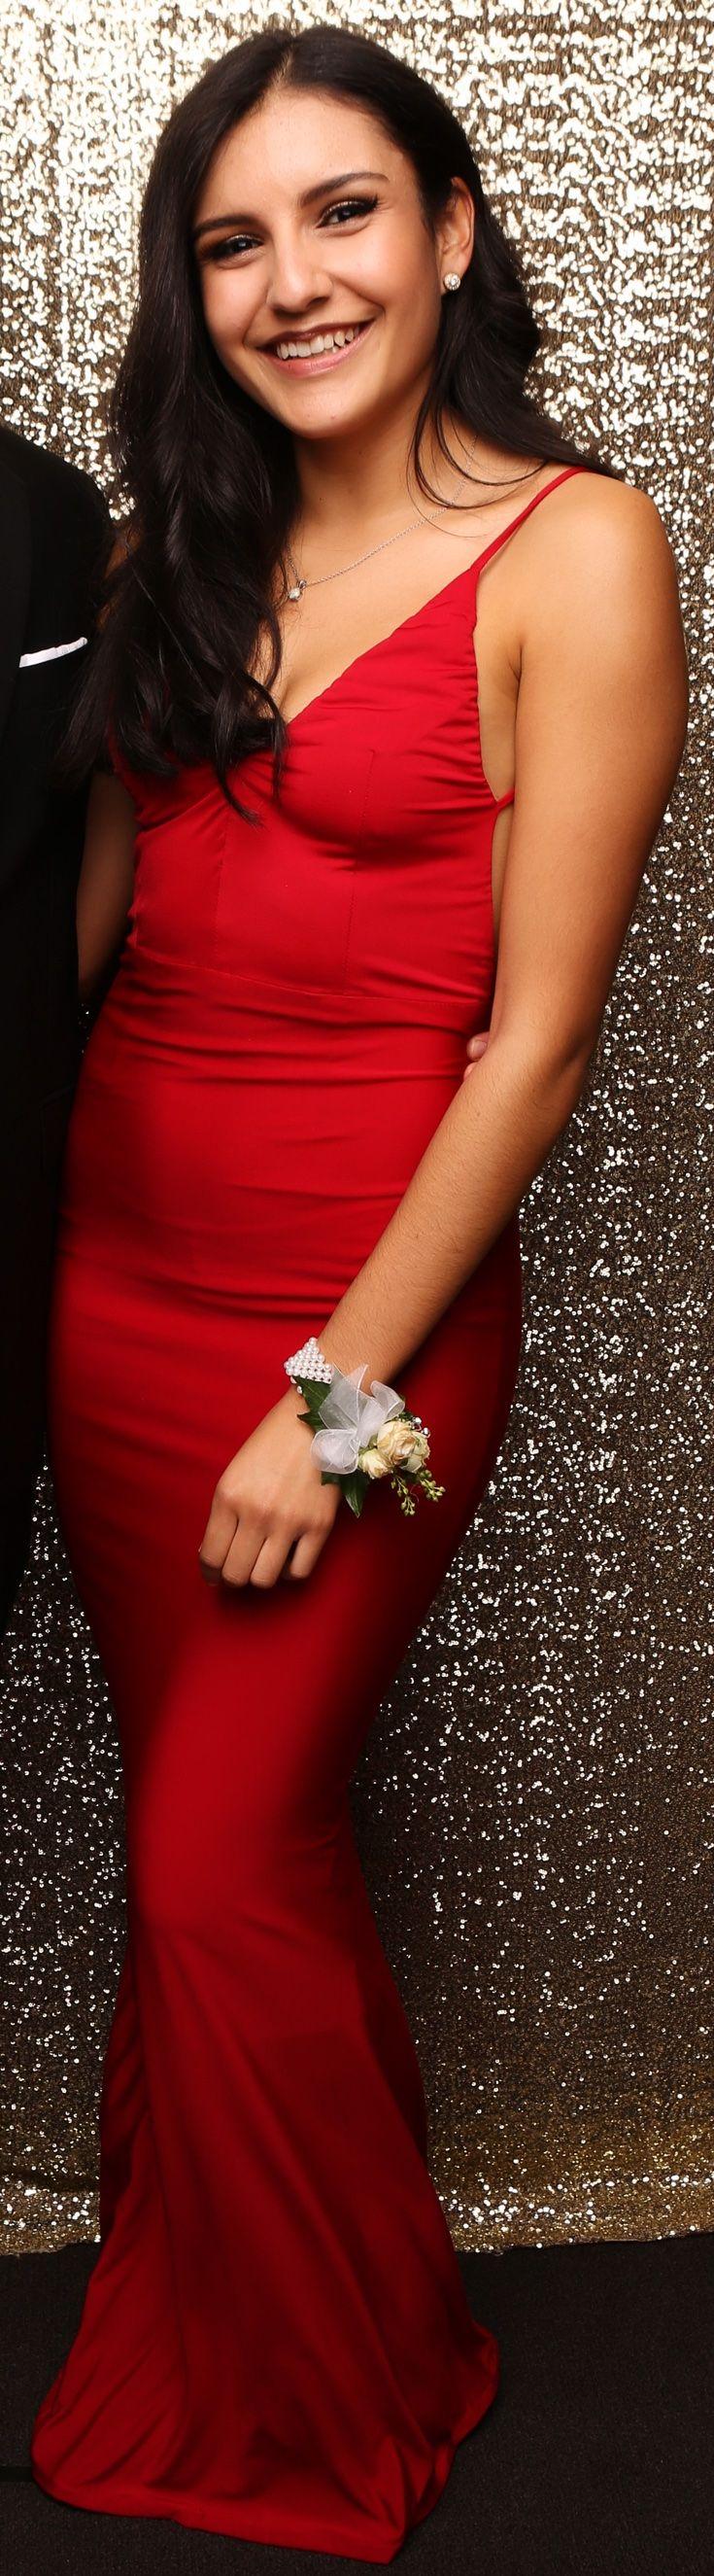 Glendowie Ball 2016. Super gorgeous! www.whitedoor.co.nz